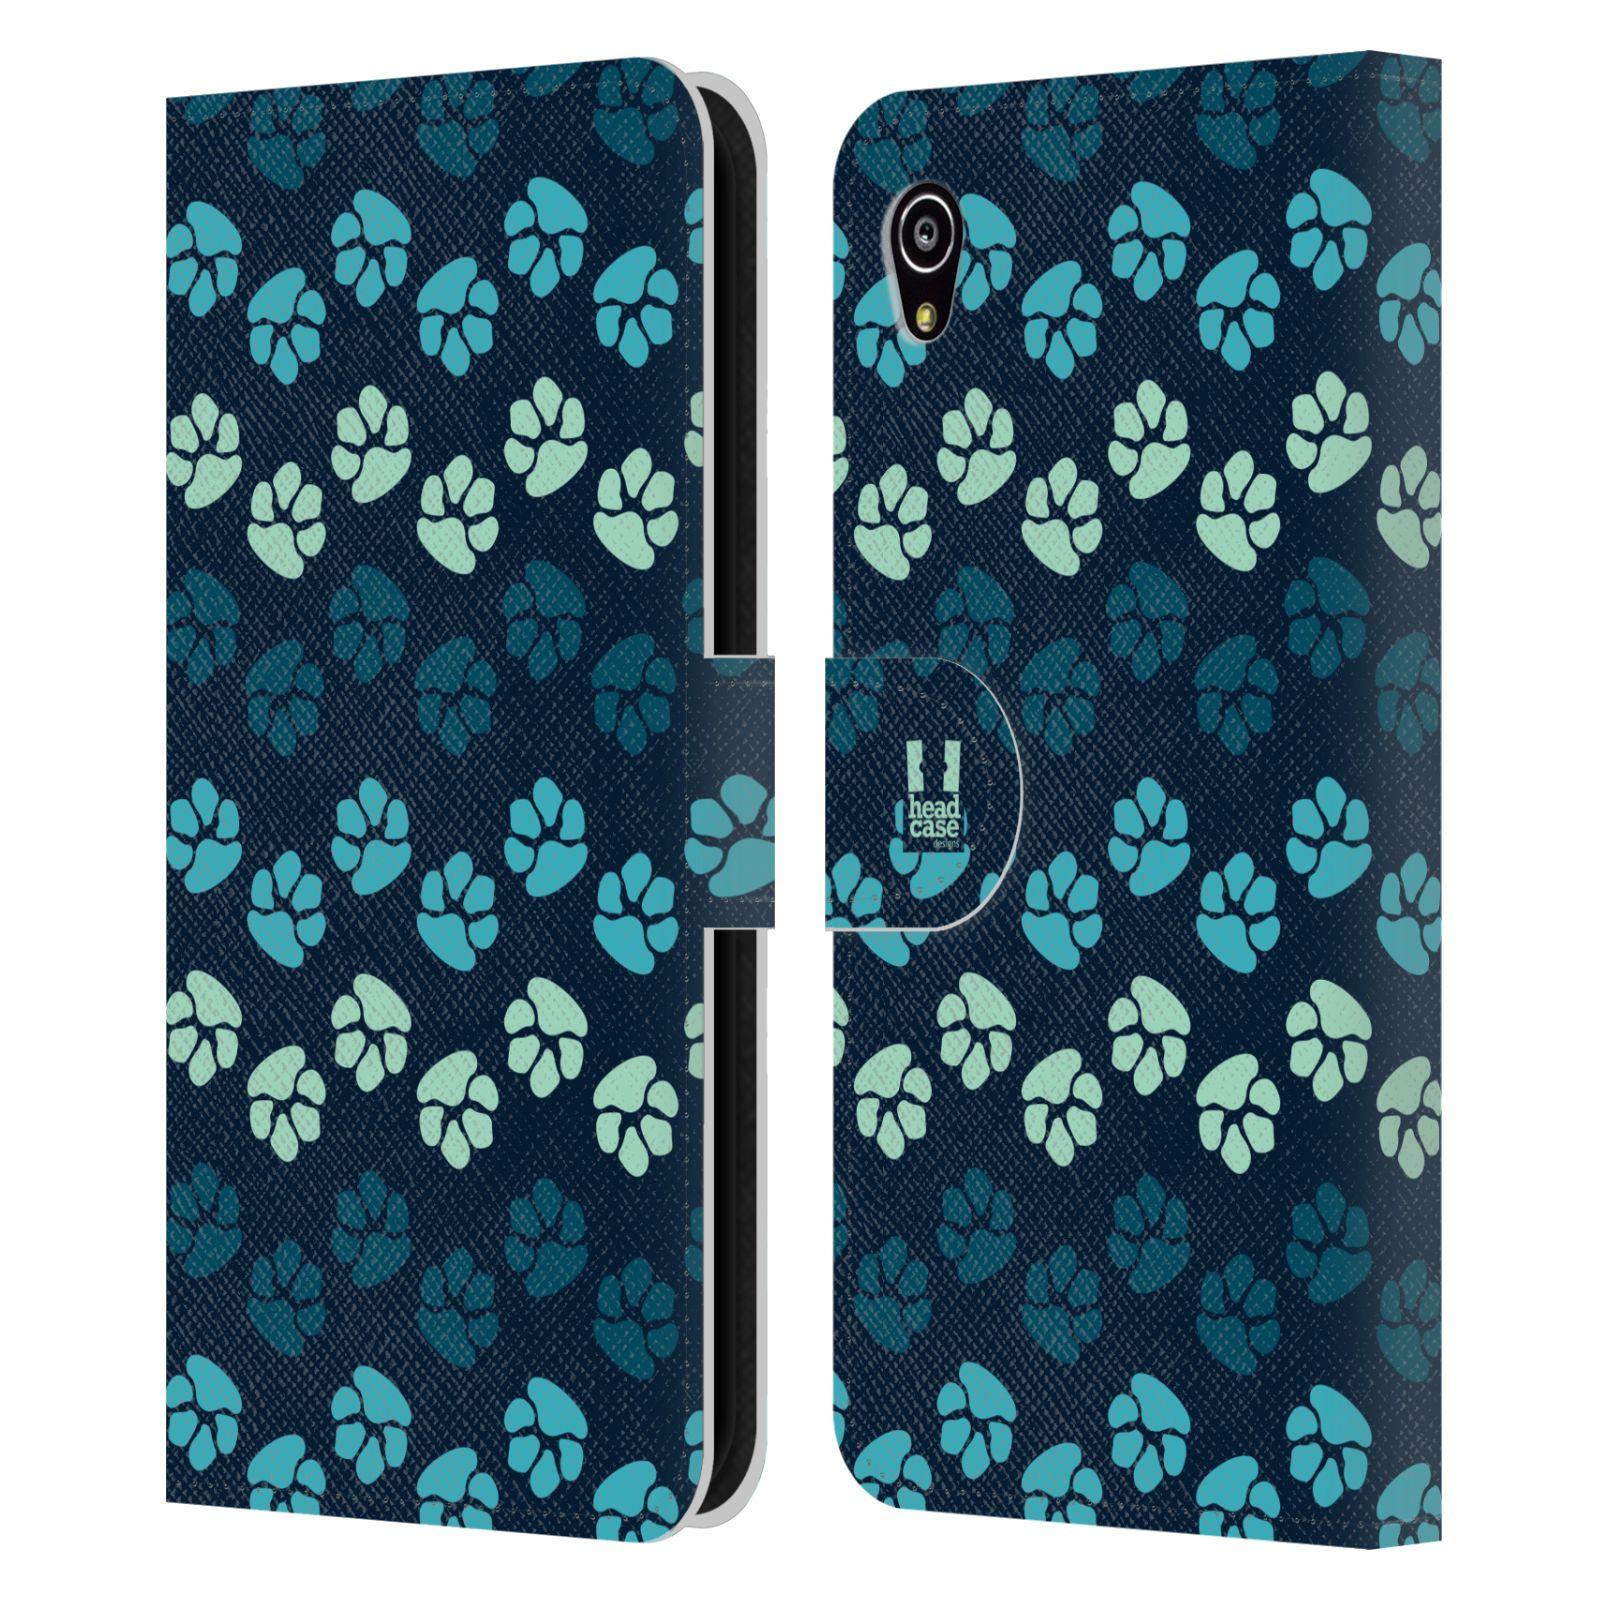 HEAD CASE Flipové pouzdro pro mobil SONY XPERIA M4 AQUA Pejsek ťapky modrá barva